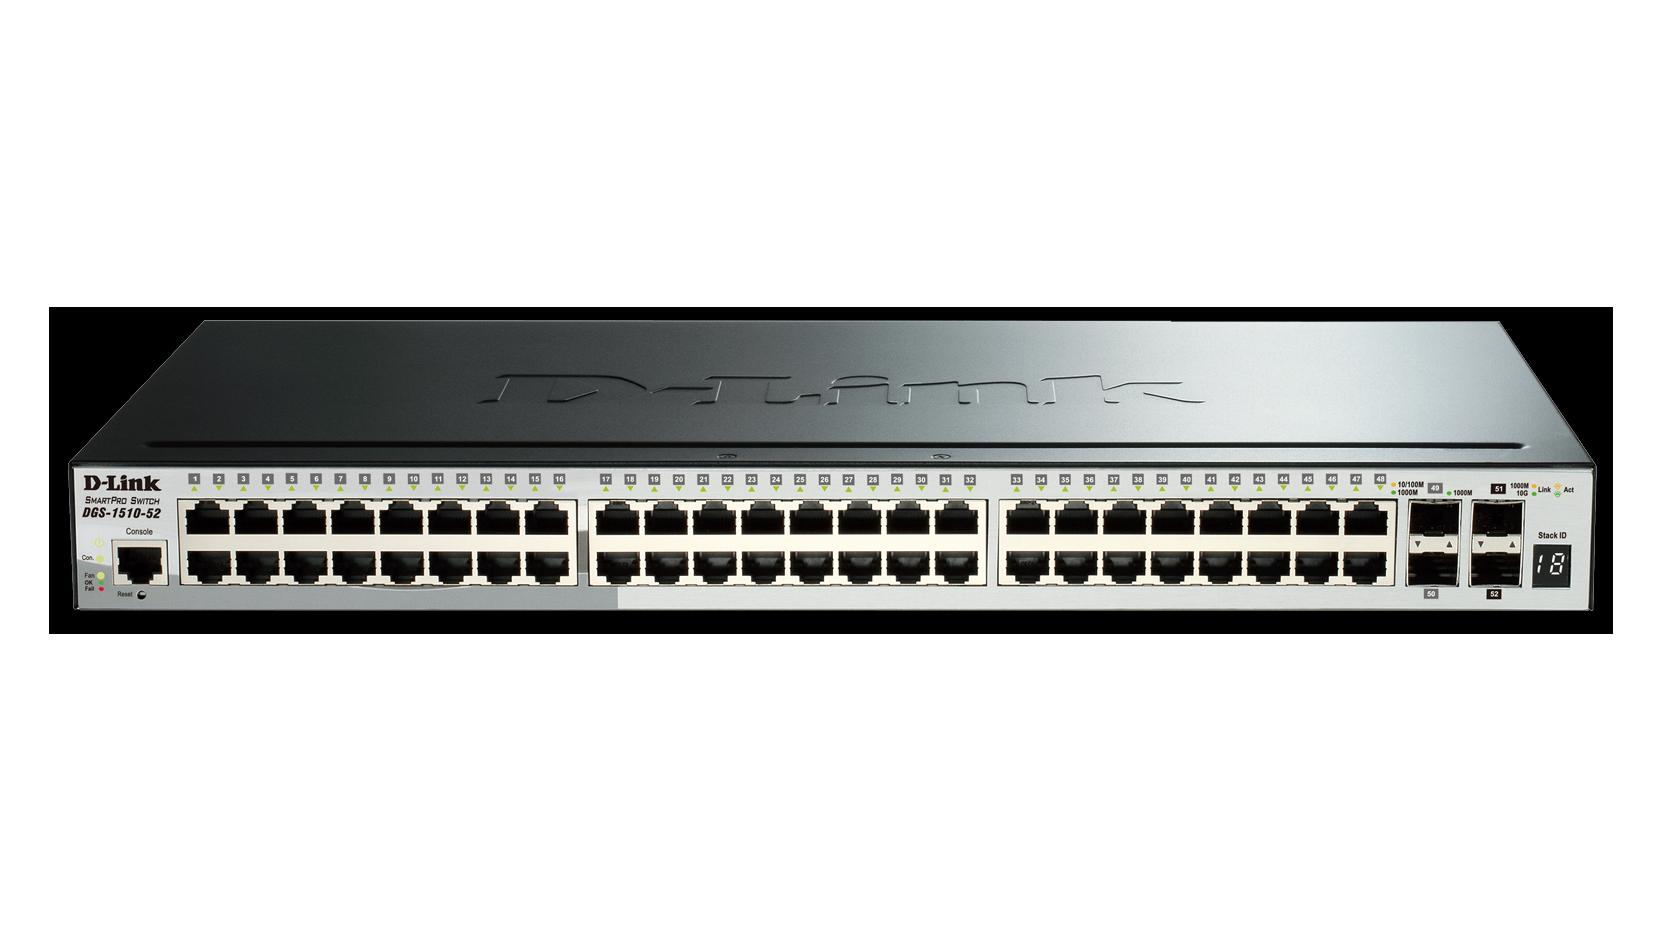 Switch D-Link DGS-1510-52 cu management fara PoE 48x1000Mbps-RJ45 + 2xSFP + 2x10GbE SFP